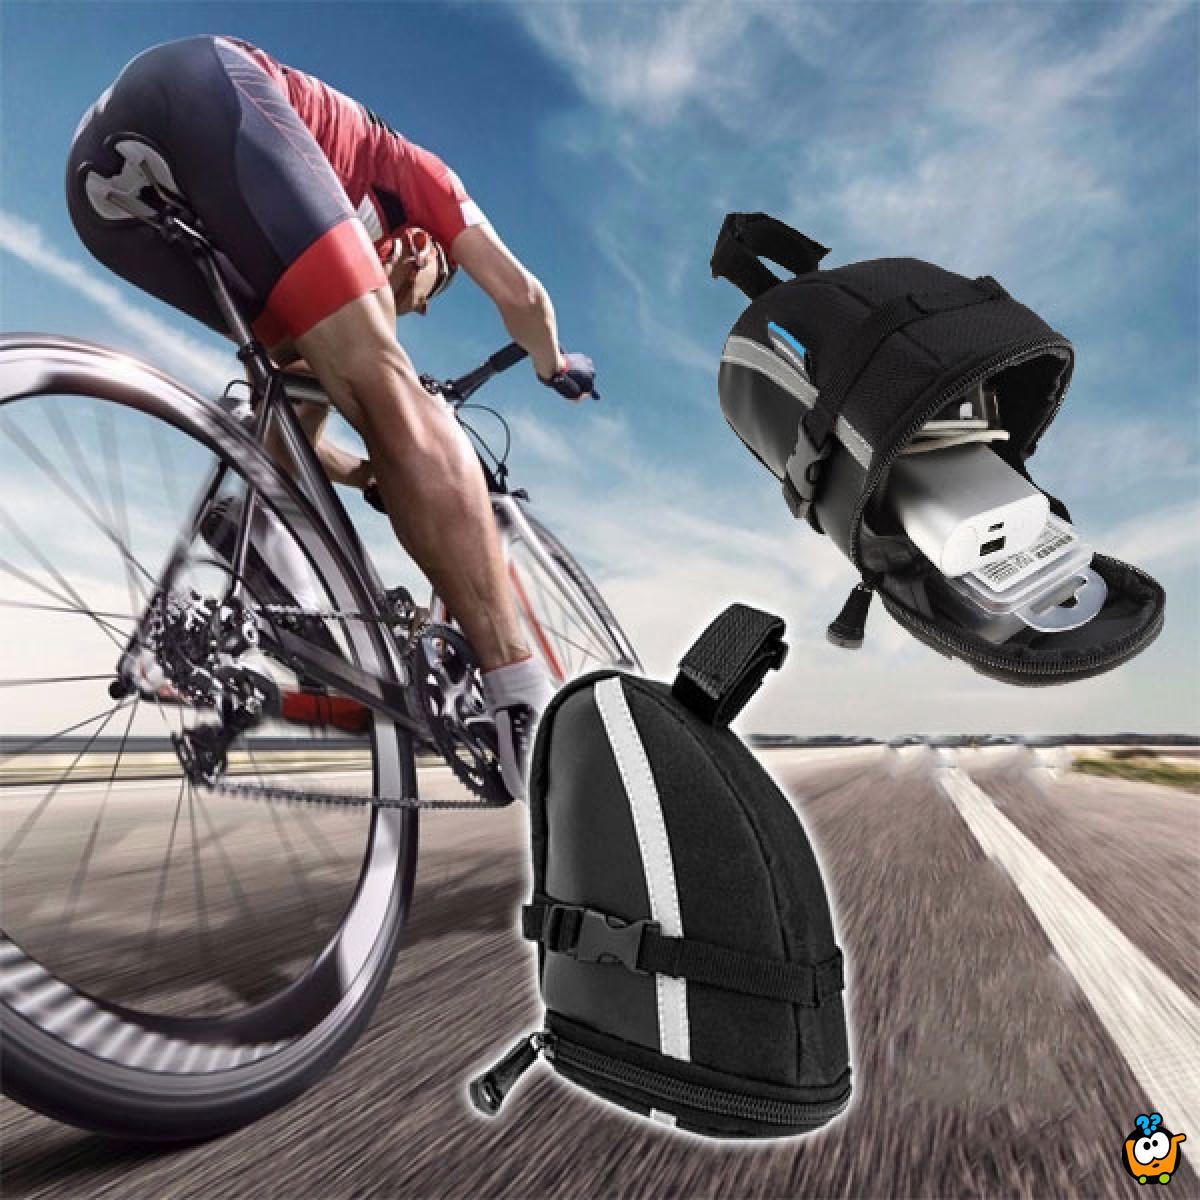 Bicycle bag – Mini moderna torba za bicikl